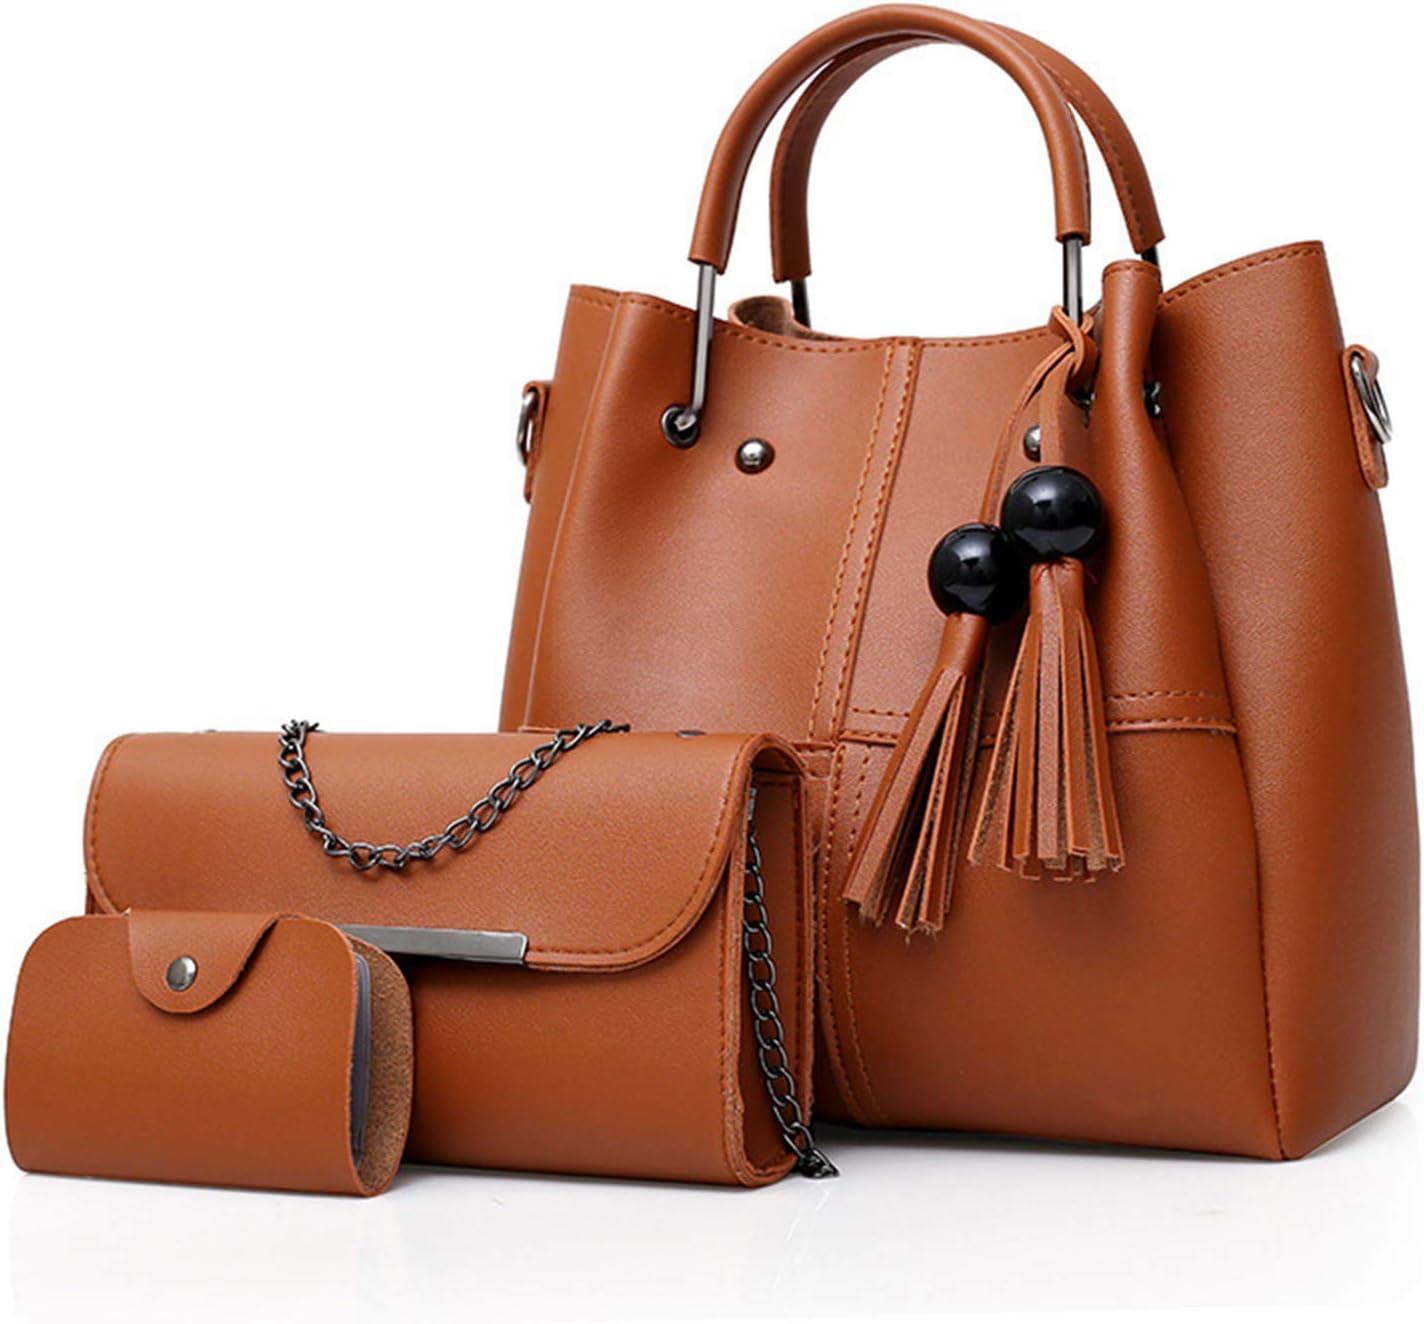 BAFEYU Women's Handbags Max 73% OFF Fashion Women Max 41% OFF Wallet PU Leather